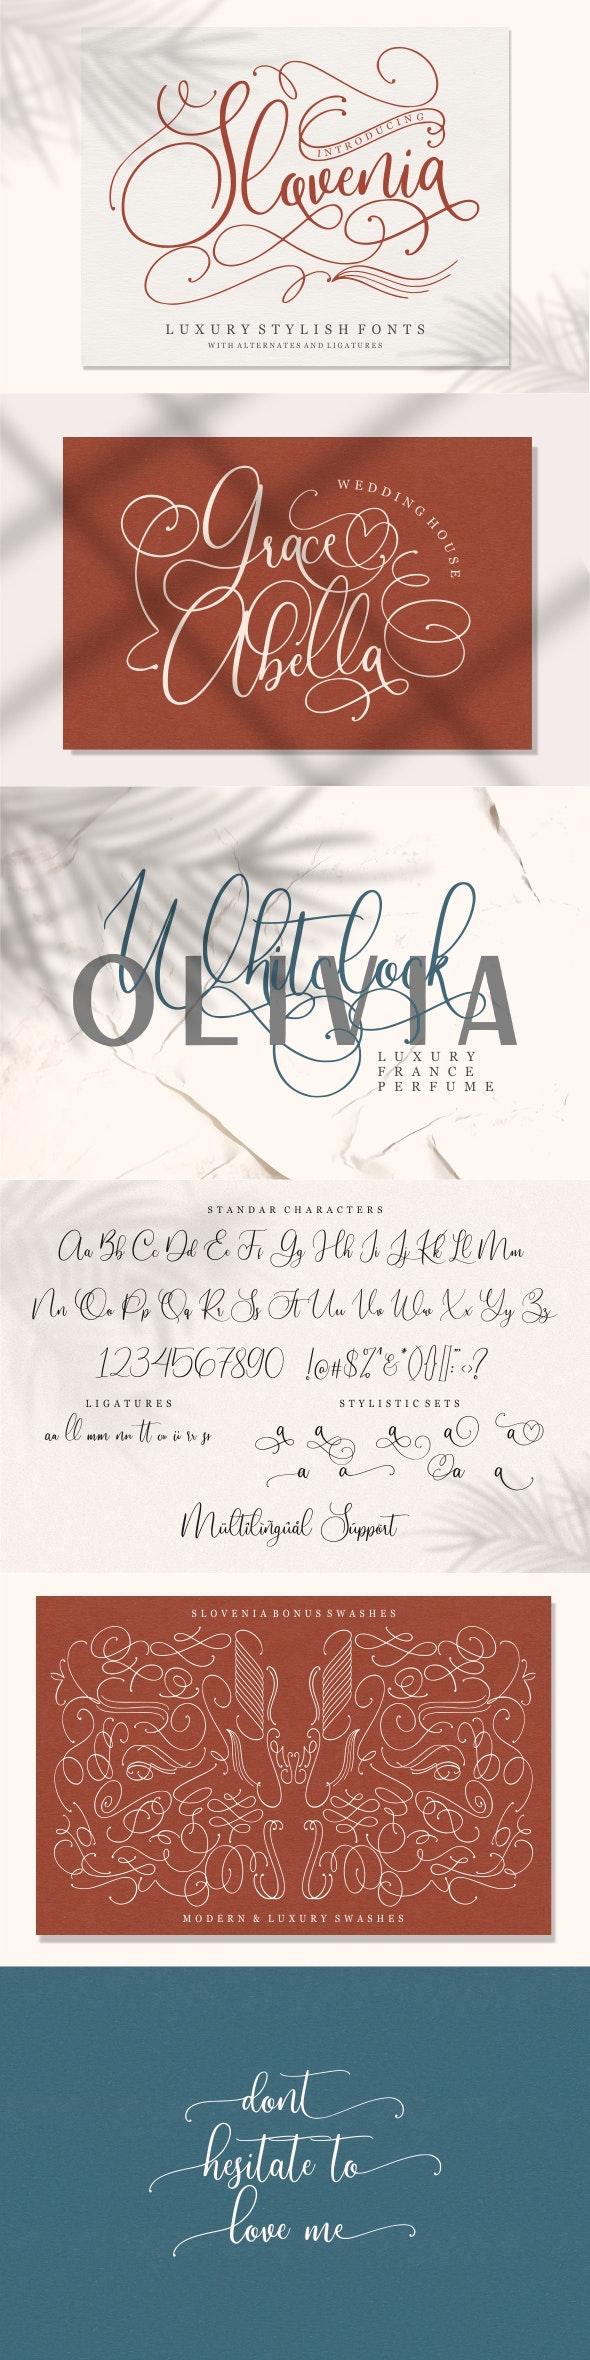 Slovenia - Calligraphy Script